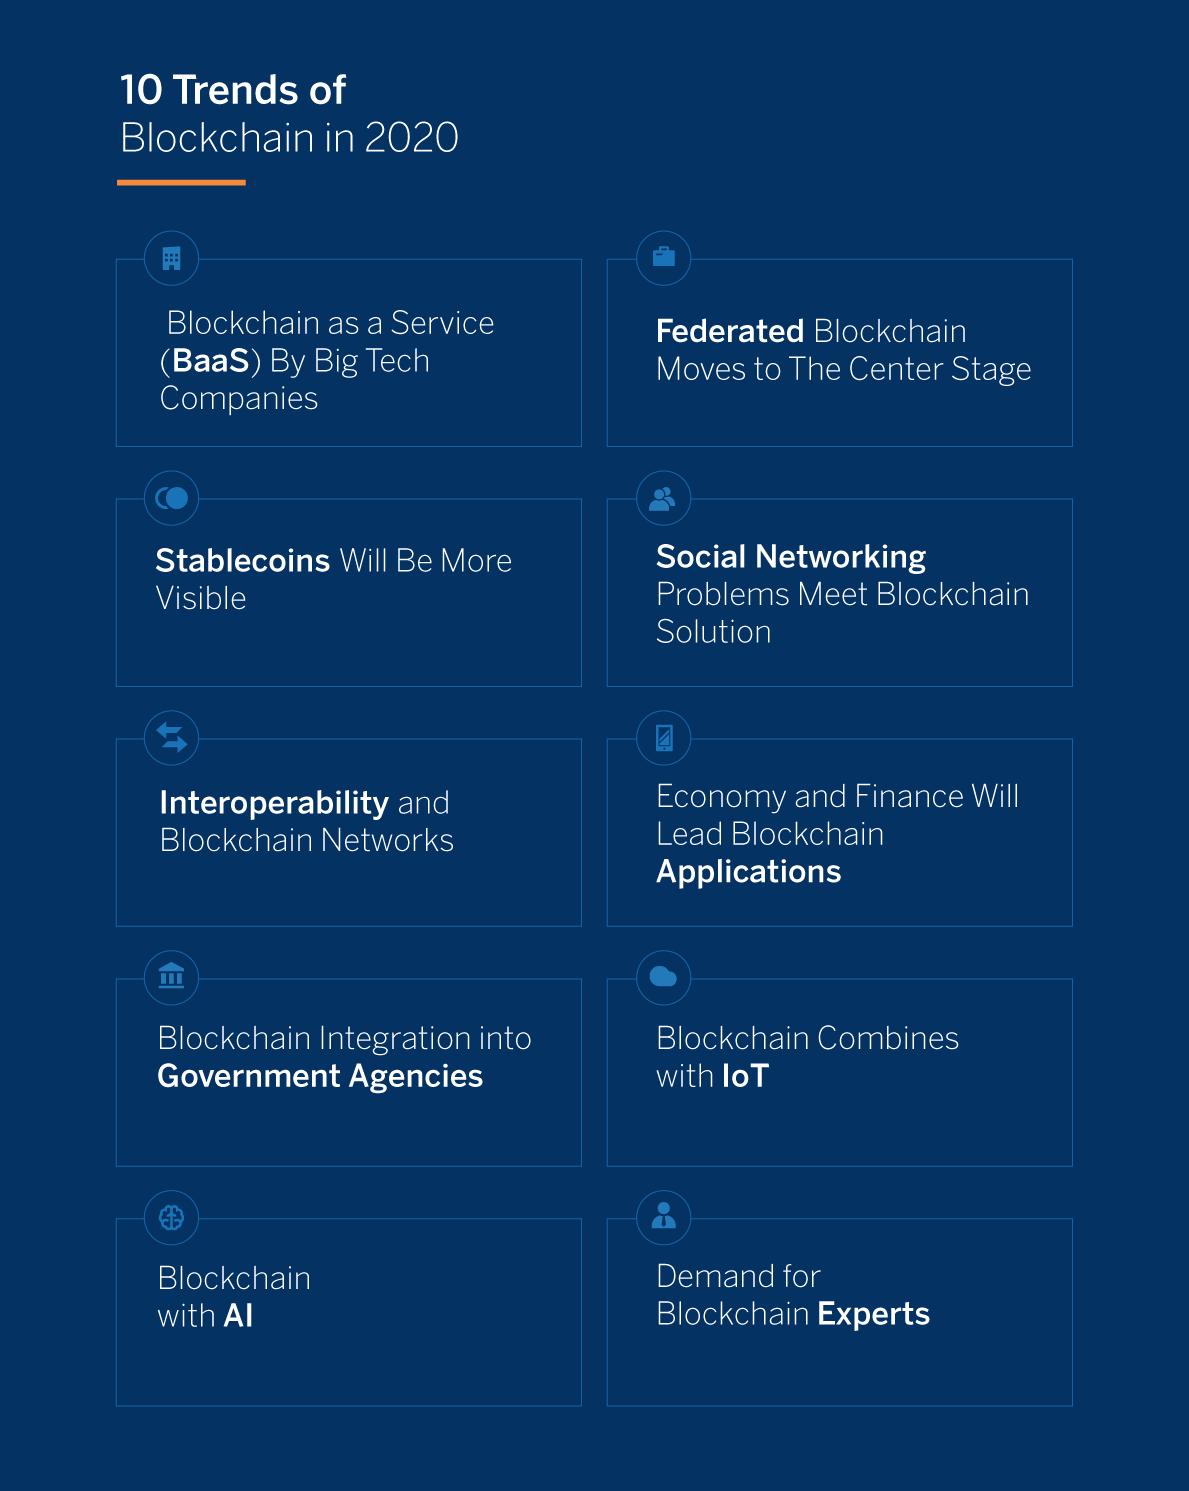 BBVA-OpenMind-Ahmed Banafa-2020 Trends-Blockchain-2